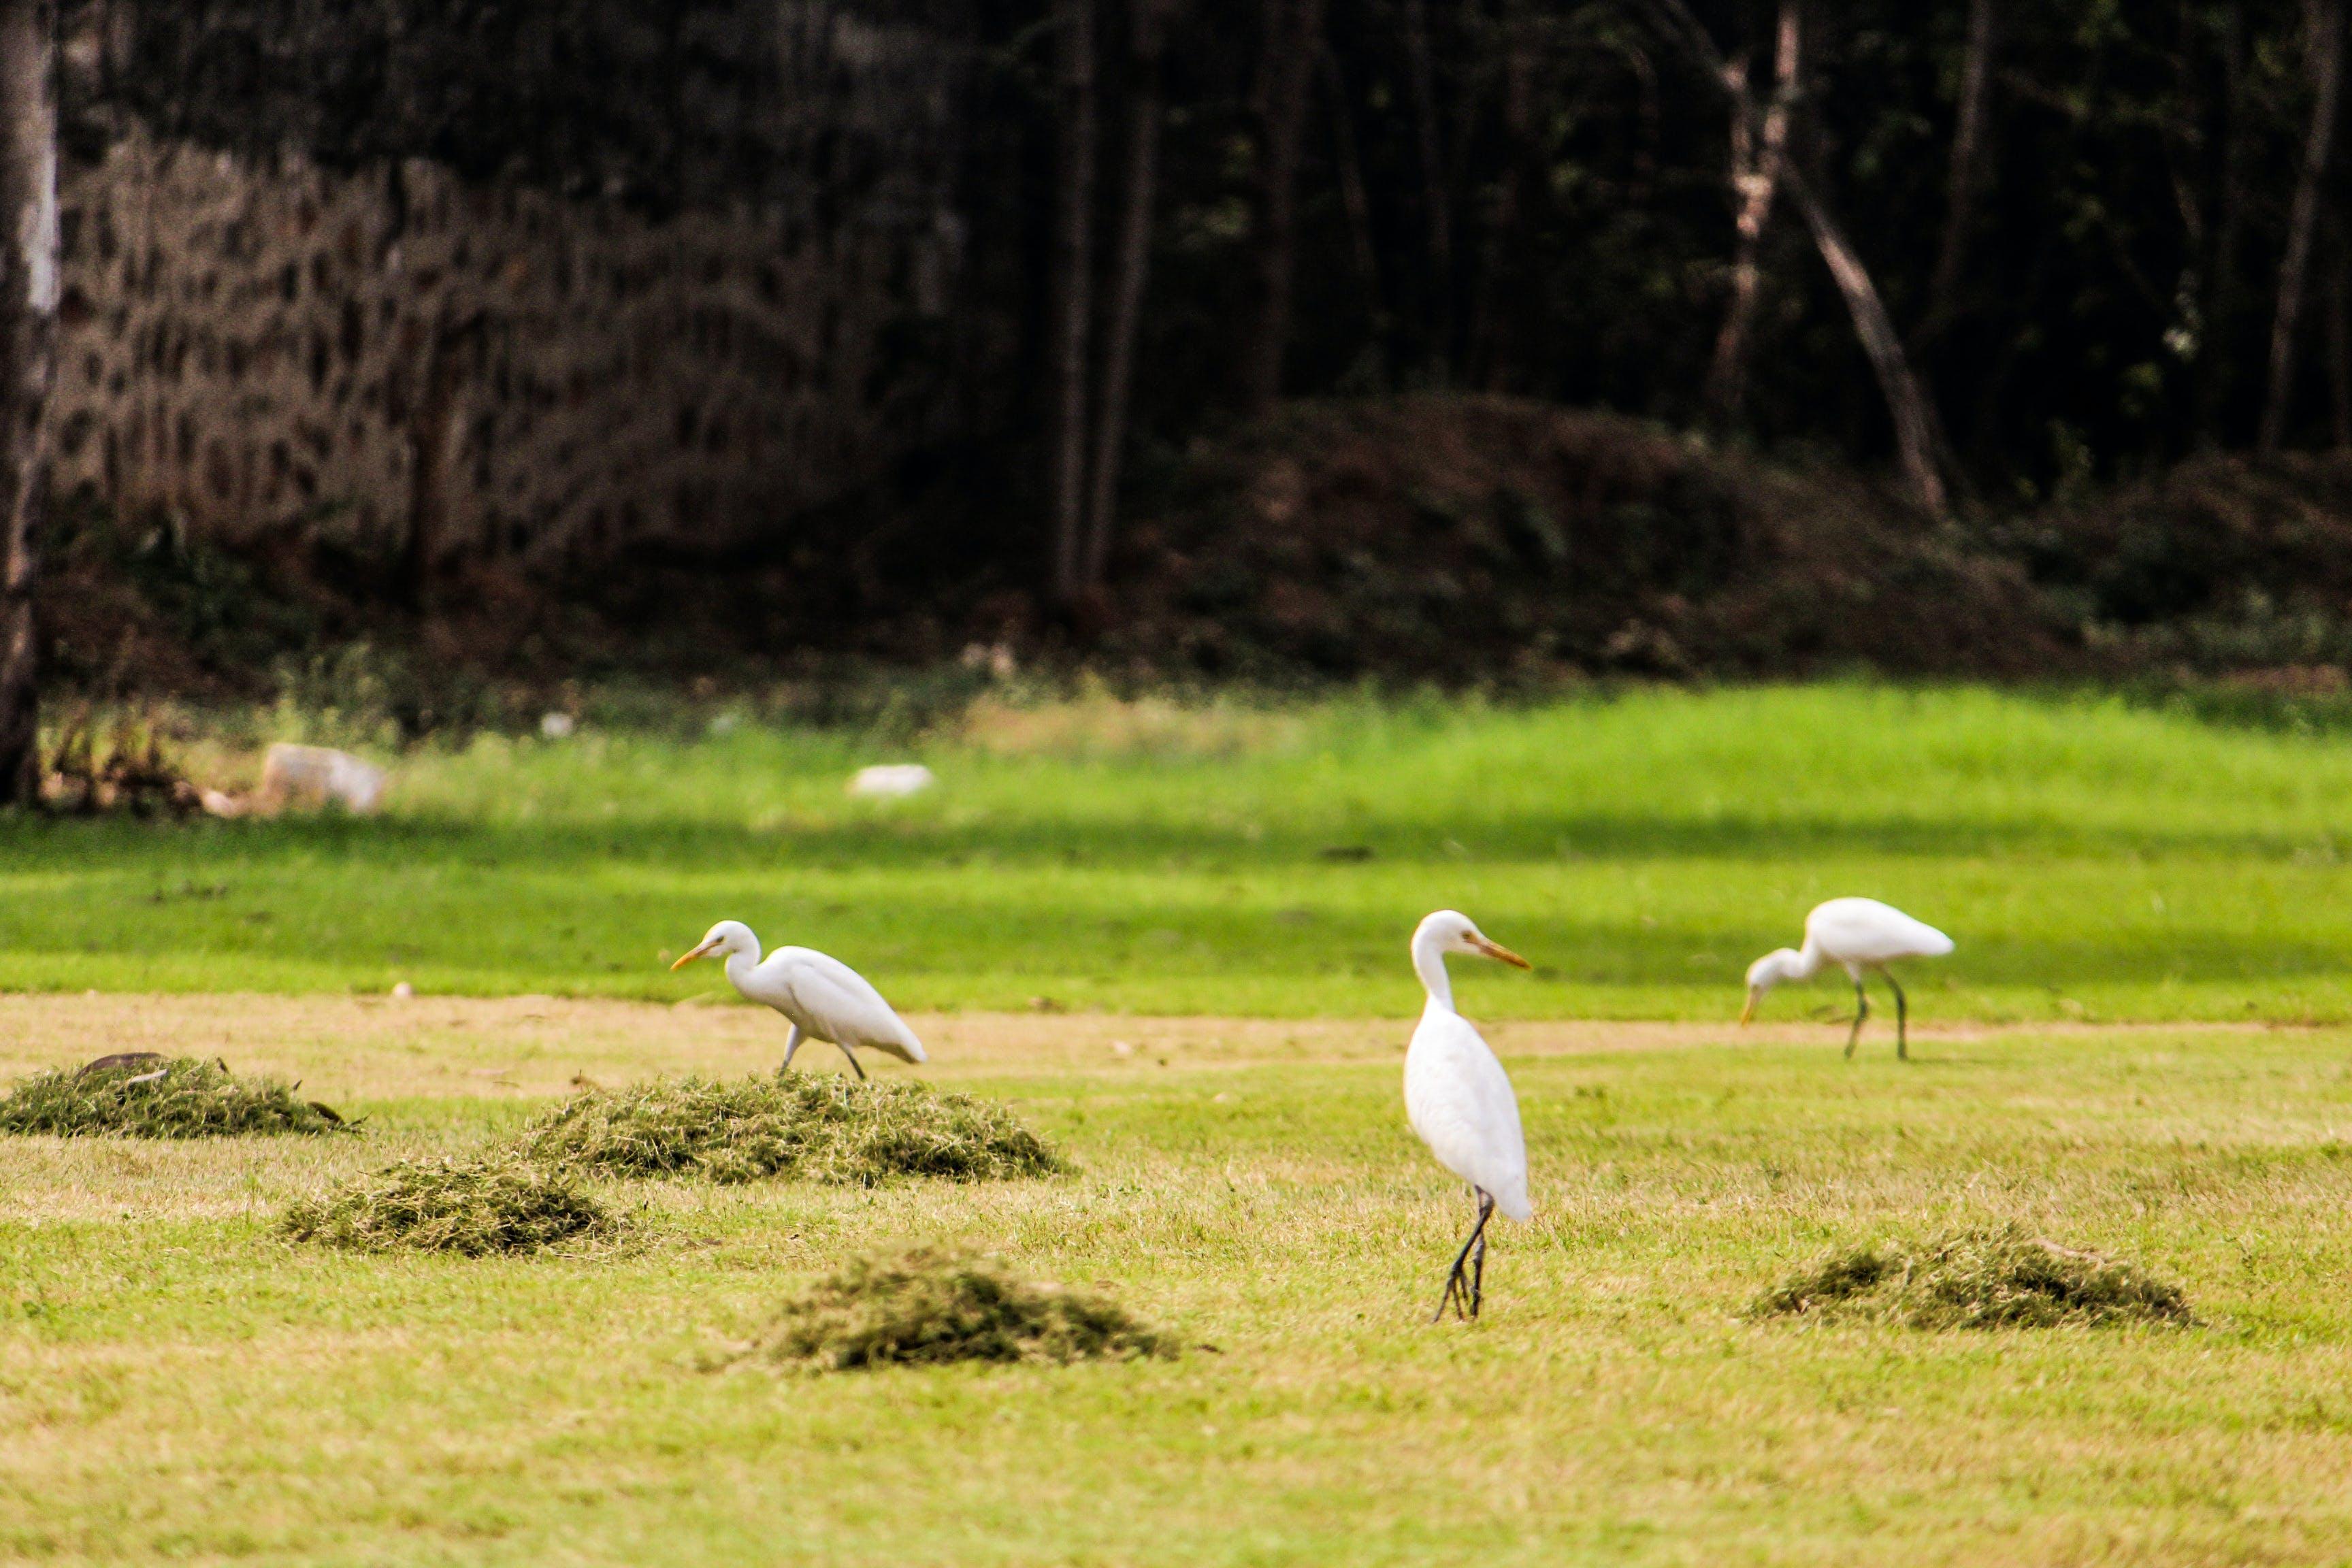 Free stock photo of #outdoorchallenge, beauty in nature, bird, bird feeder